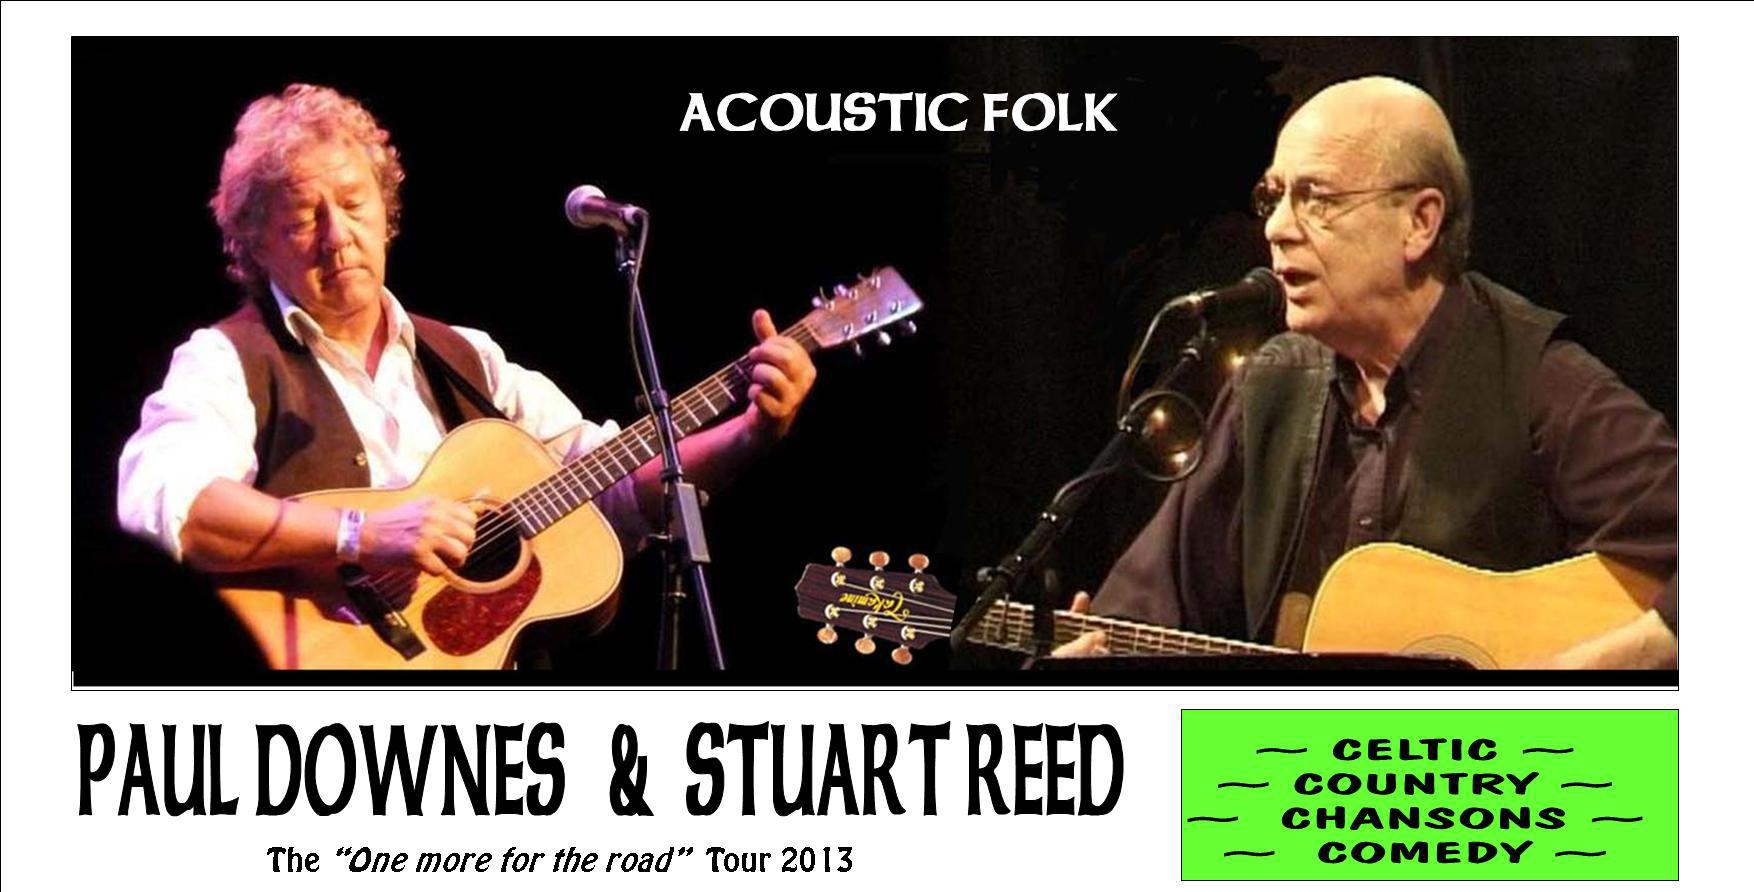 Paul Downes & Stuart Reed